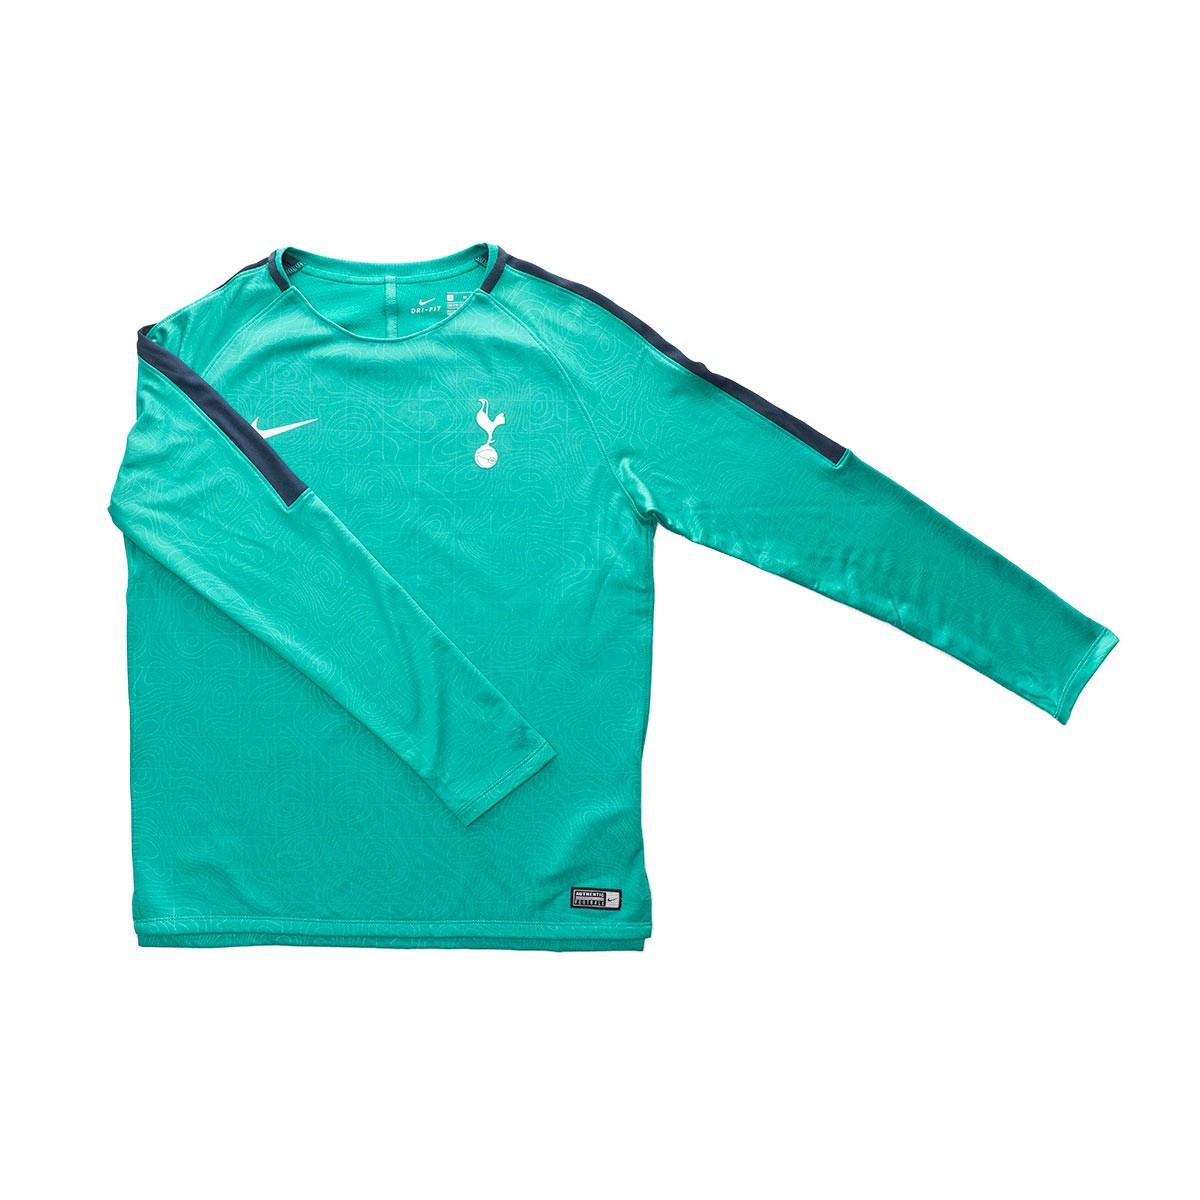 f30c523d0 Sweatshirt Nike Kids Tottenham Hotspur FC Squad 2018-2019 Neptune green-Armory  navy - Tienda de fútbol Fútbol Emotion